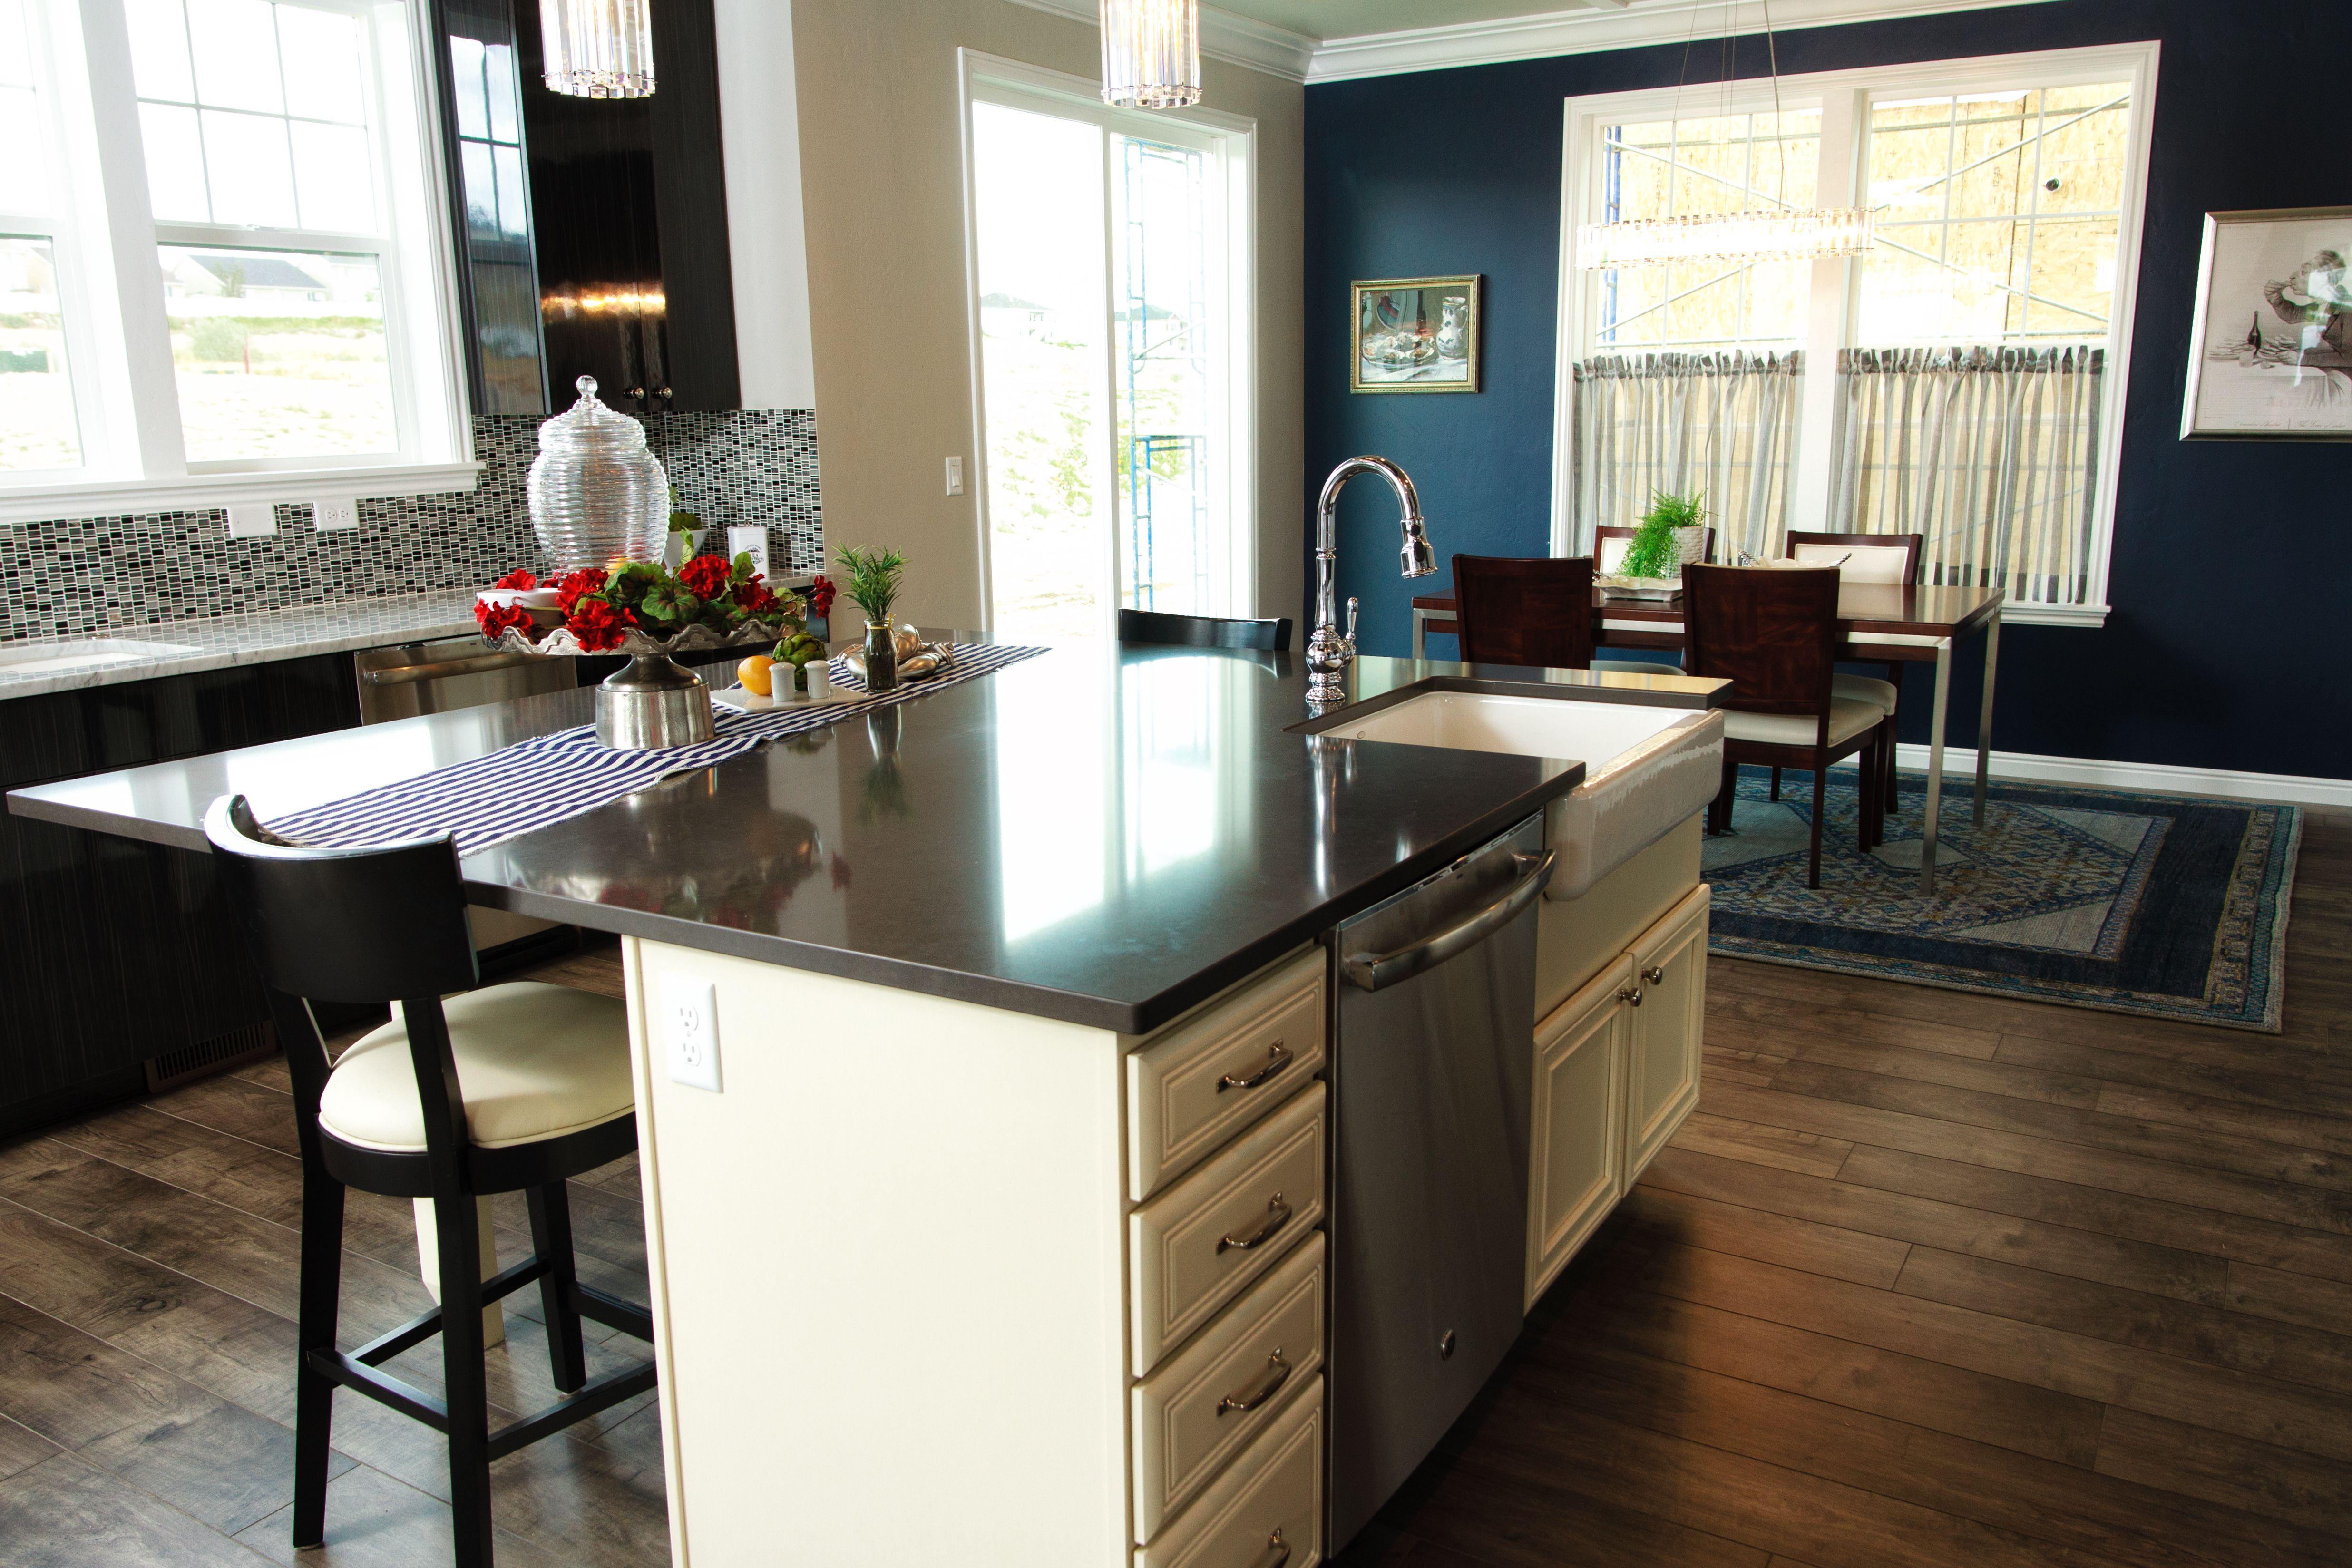 kitchen decor ideas   custom home designs   Utah Homebuilder ...